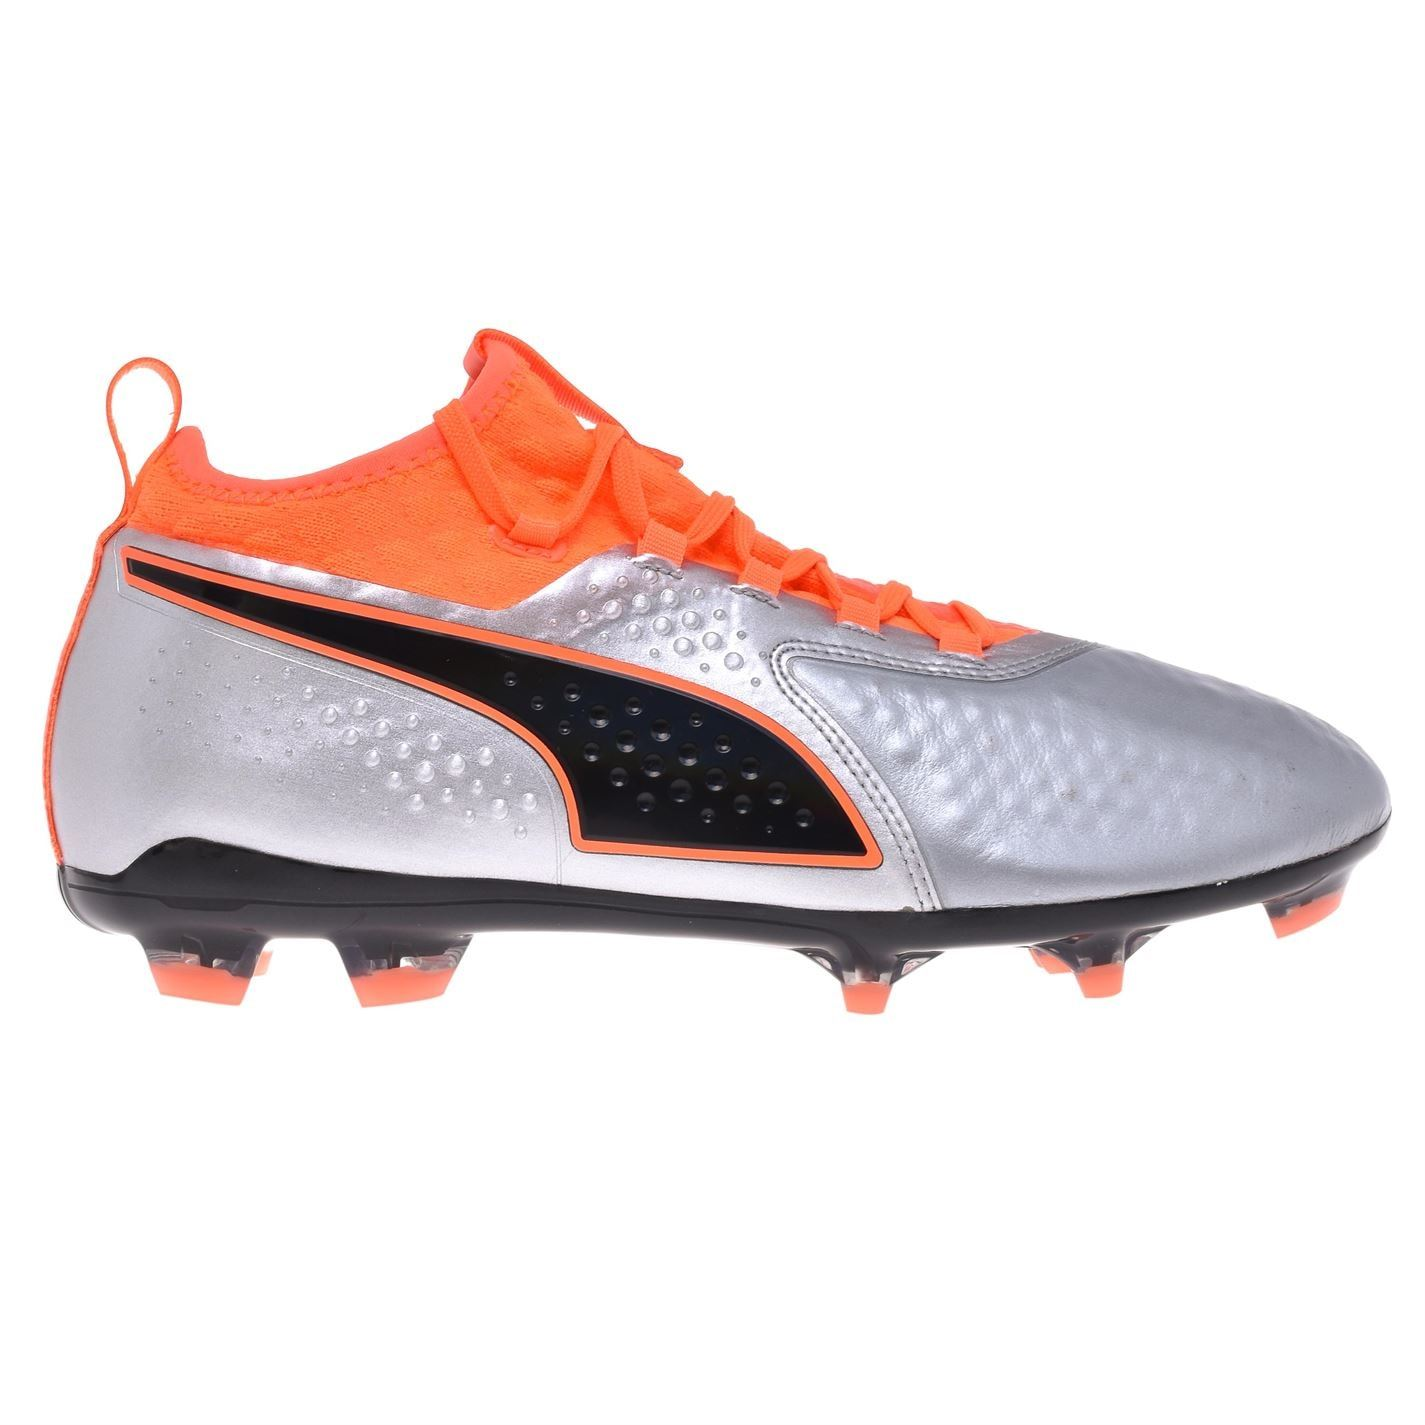 miniature 8 - Puma-One-2-Cuir-engins-fixes-Terre-Ferme-Chaussures-De-Football-Homme-Chaussures-de-foot-crampons